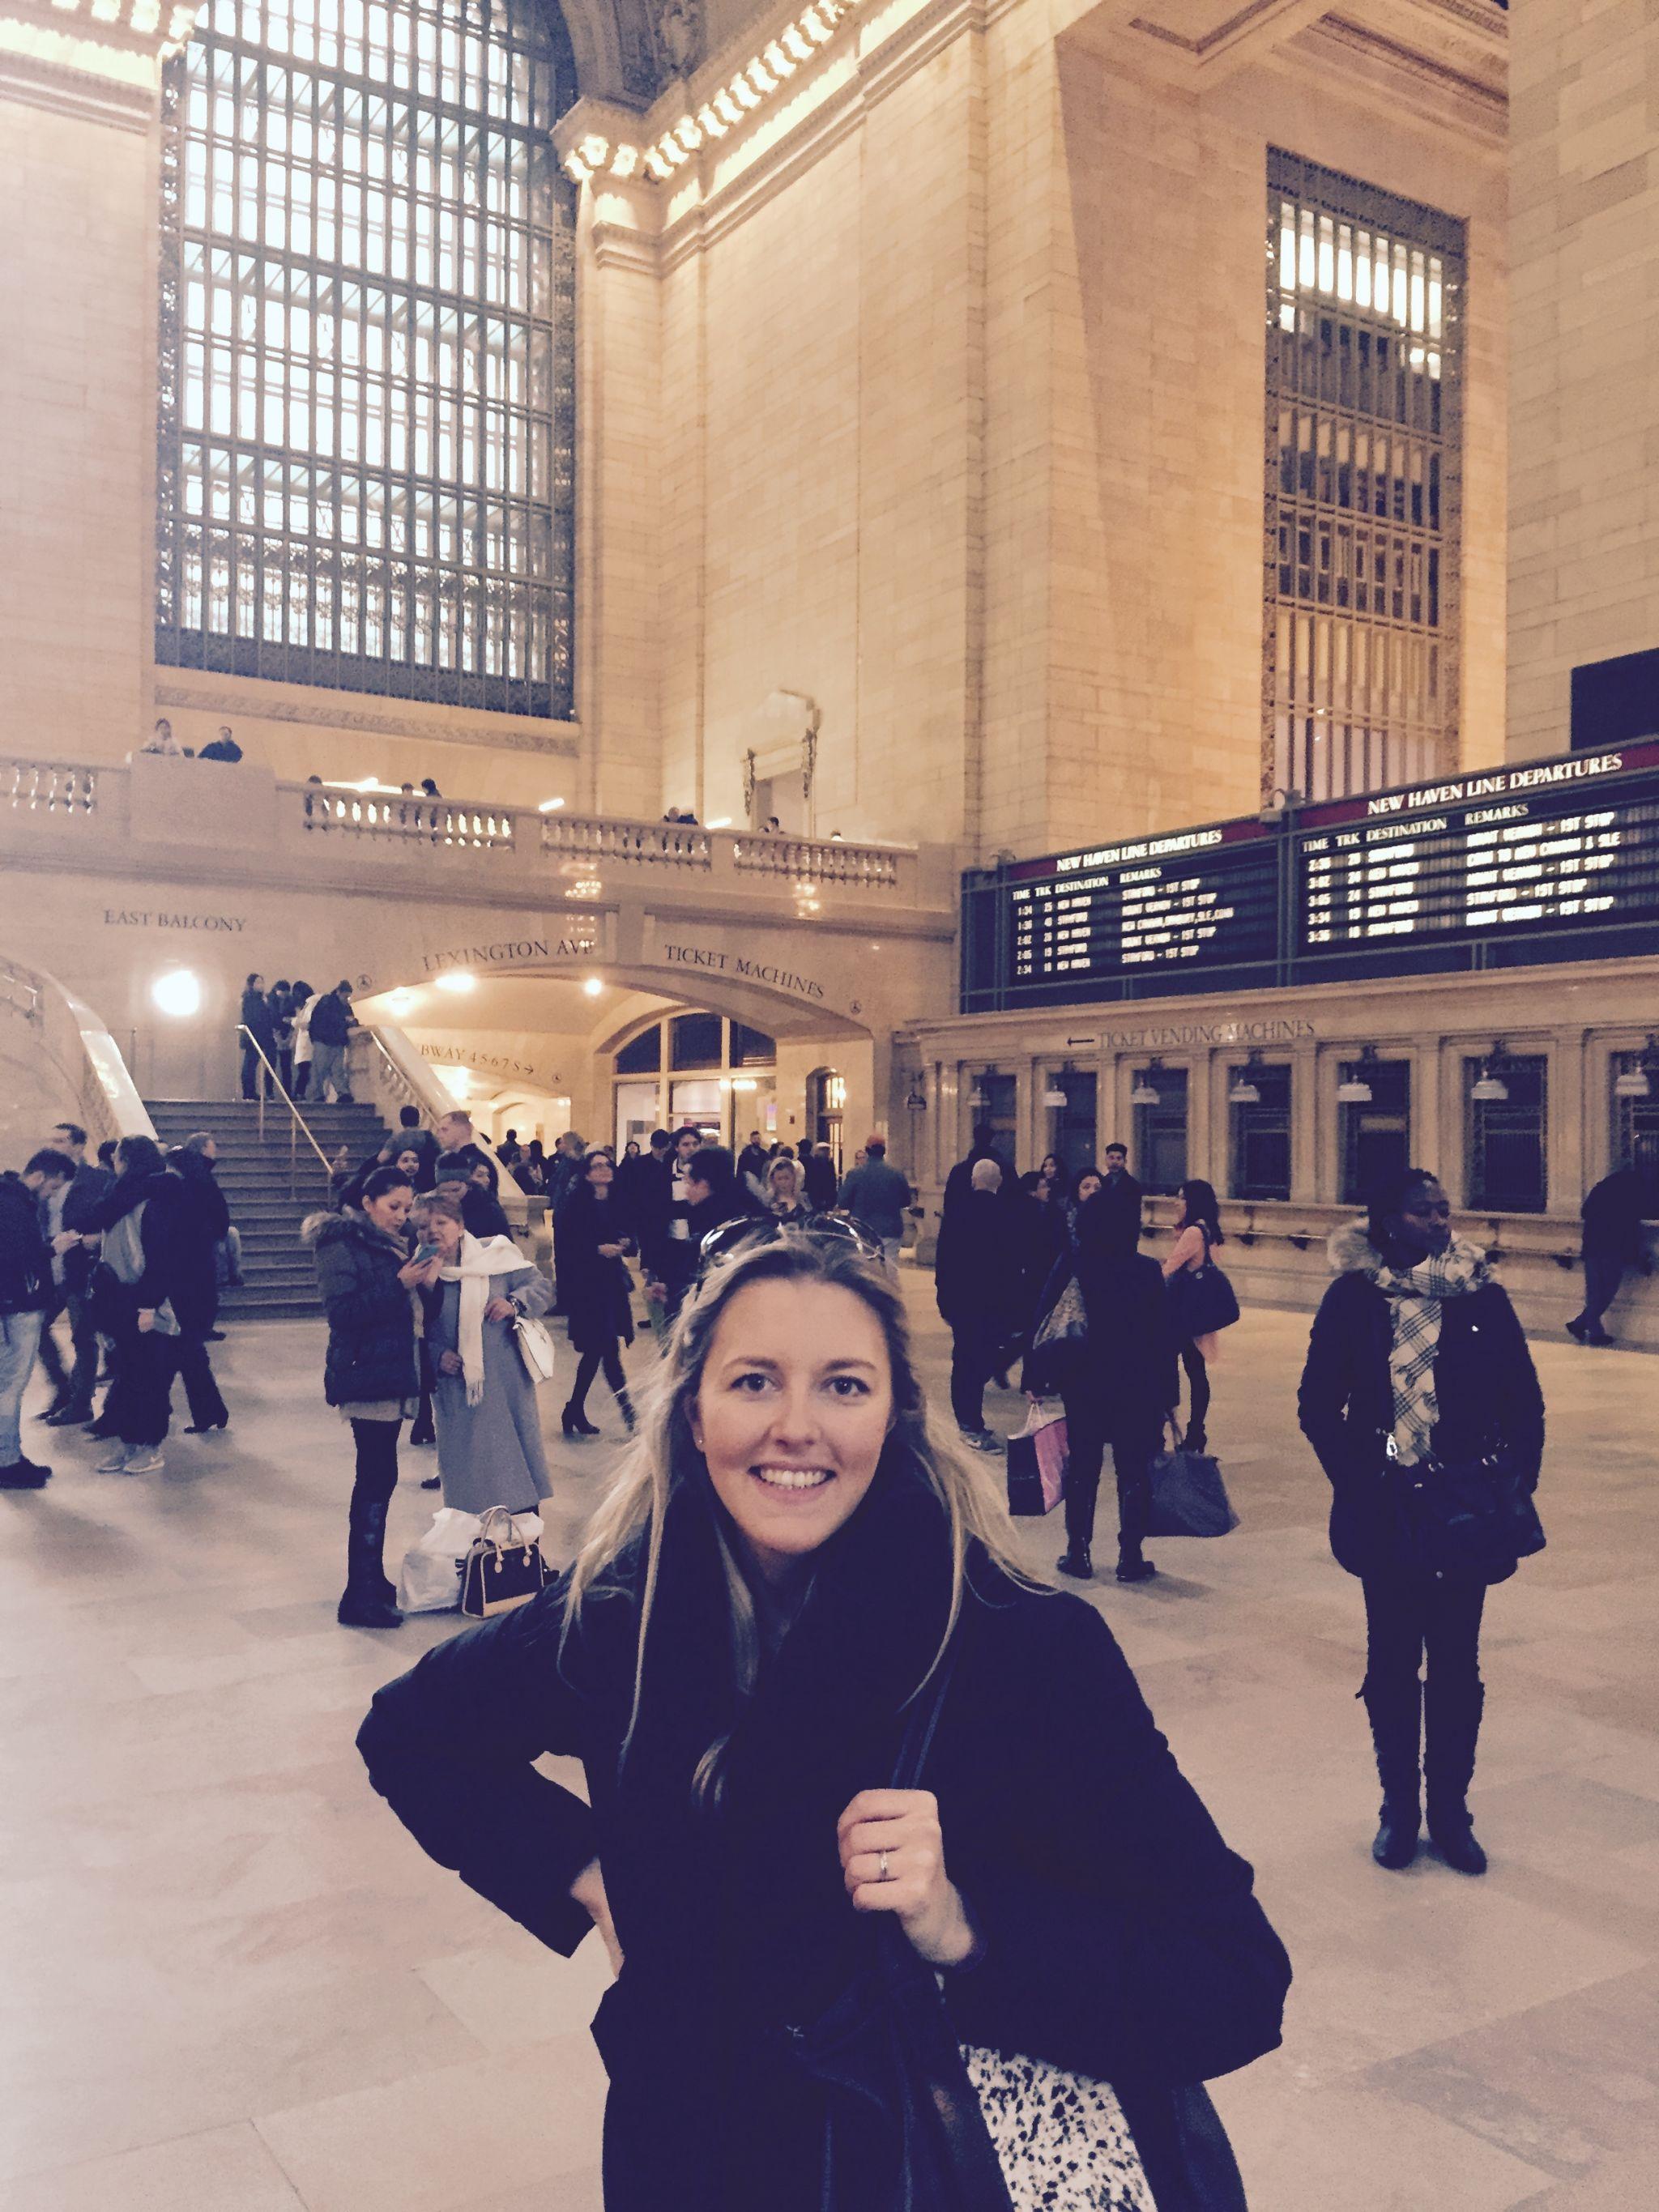 Grand-Central-Station-New-York